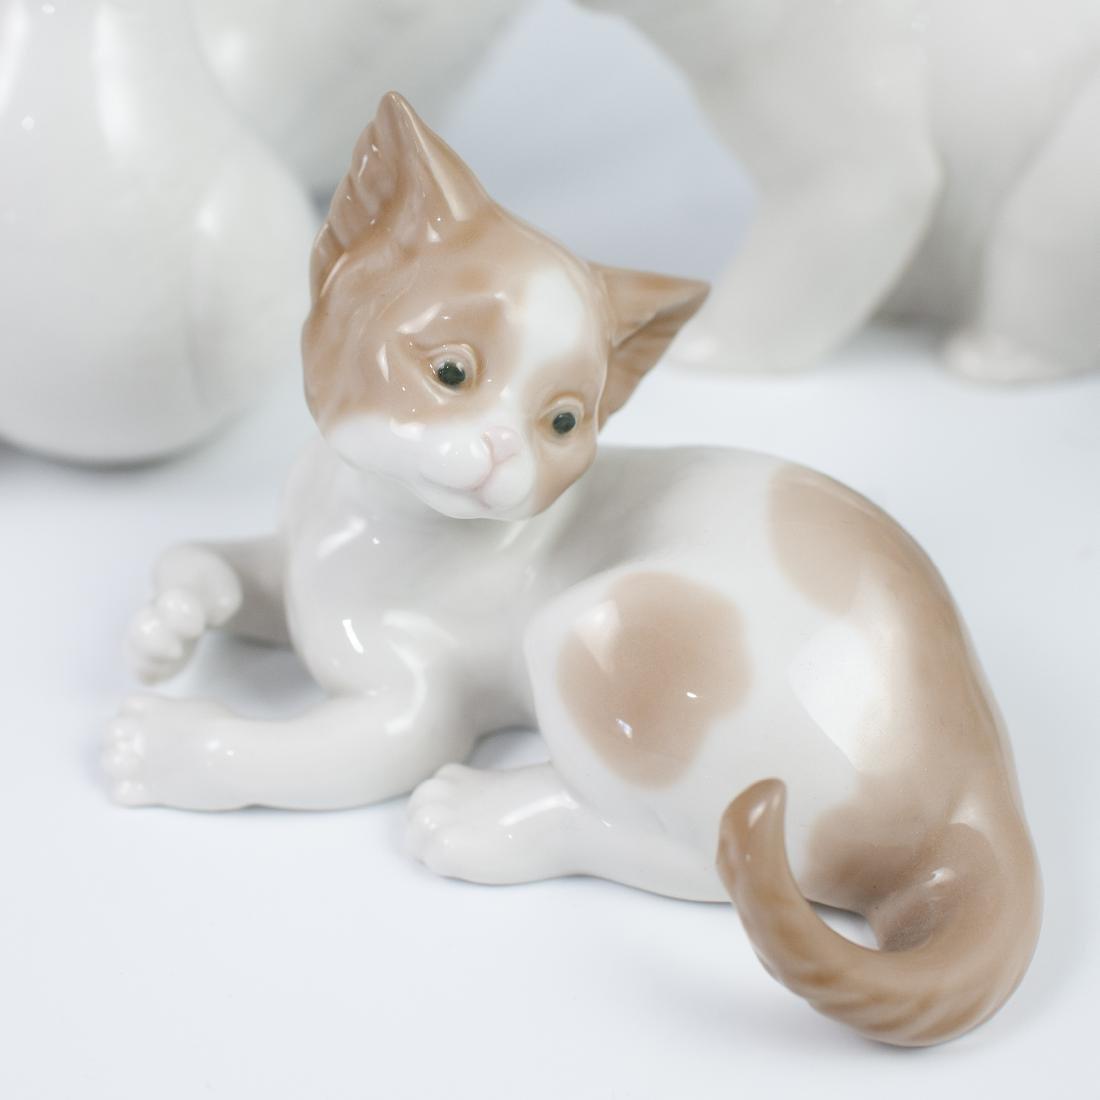 (4) Vintage Porcelain Lladro Figurines - 3